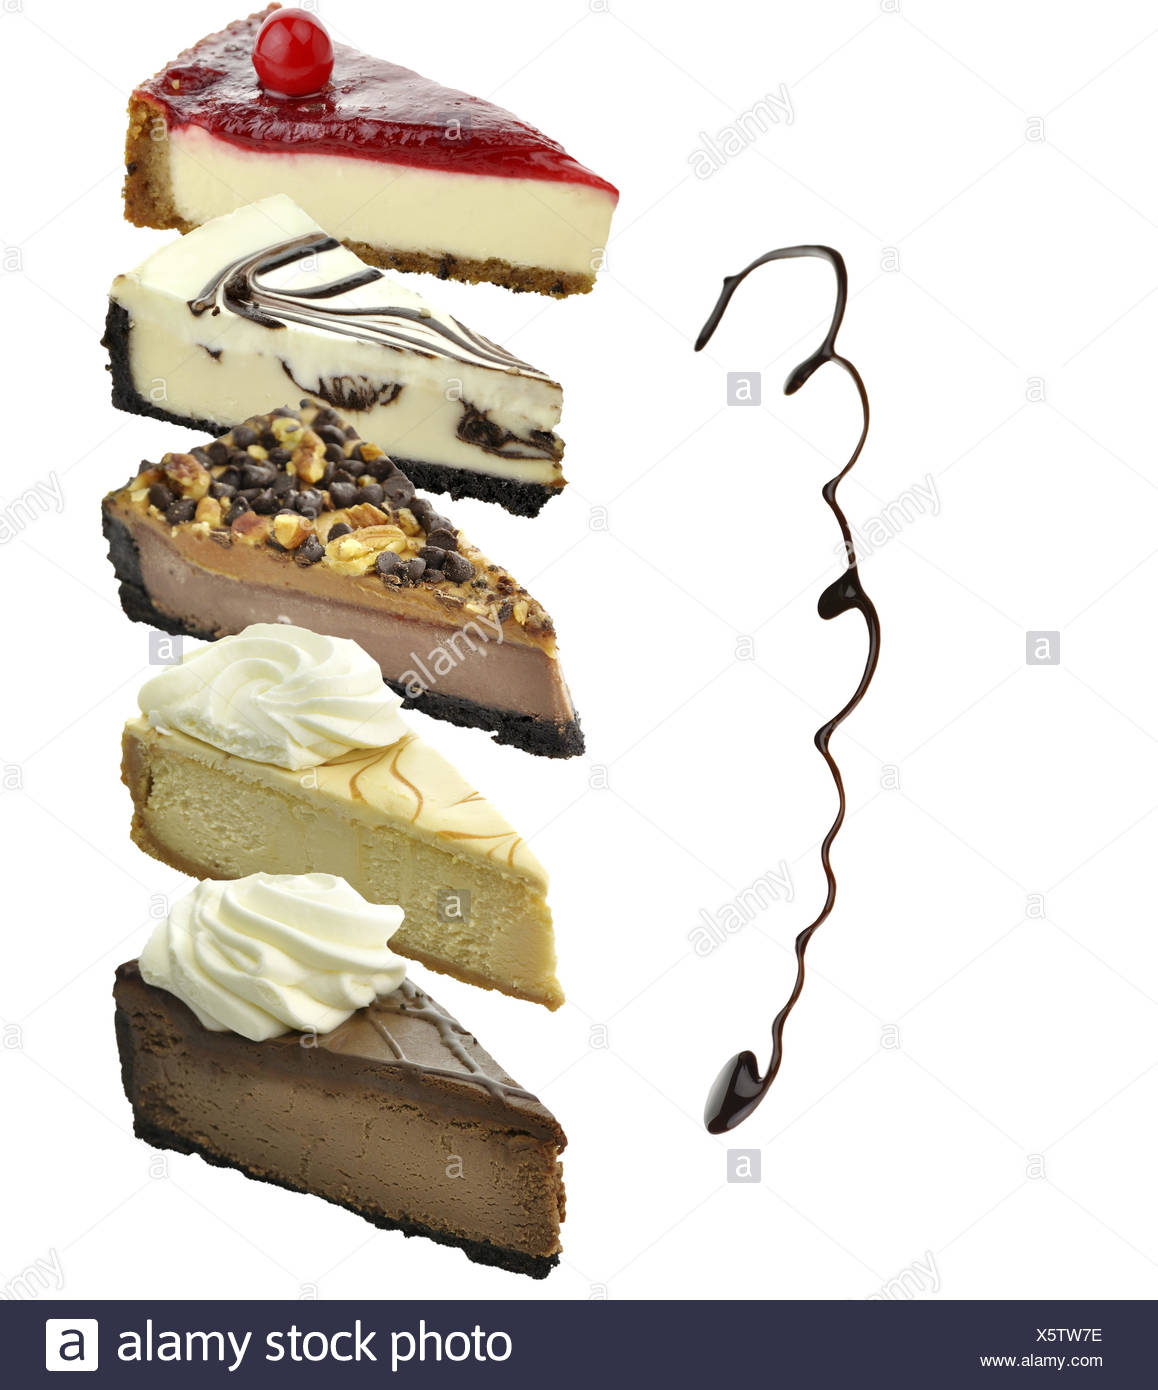 Cheesecake Slices - Stock Image